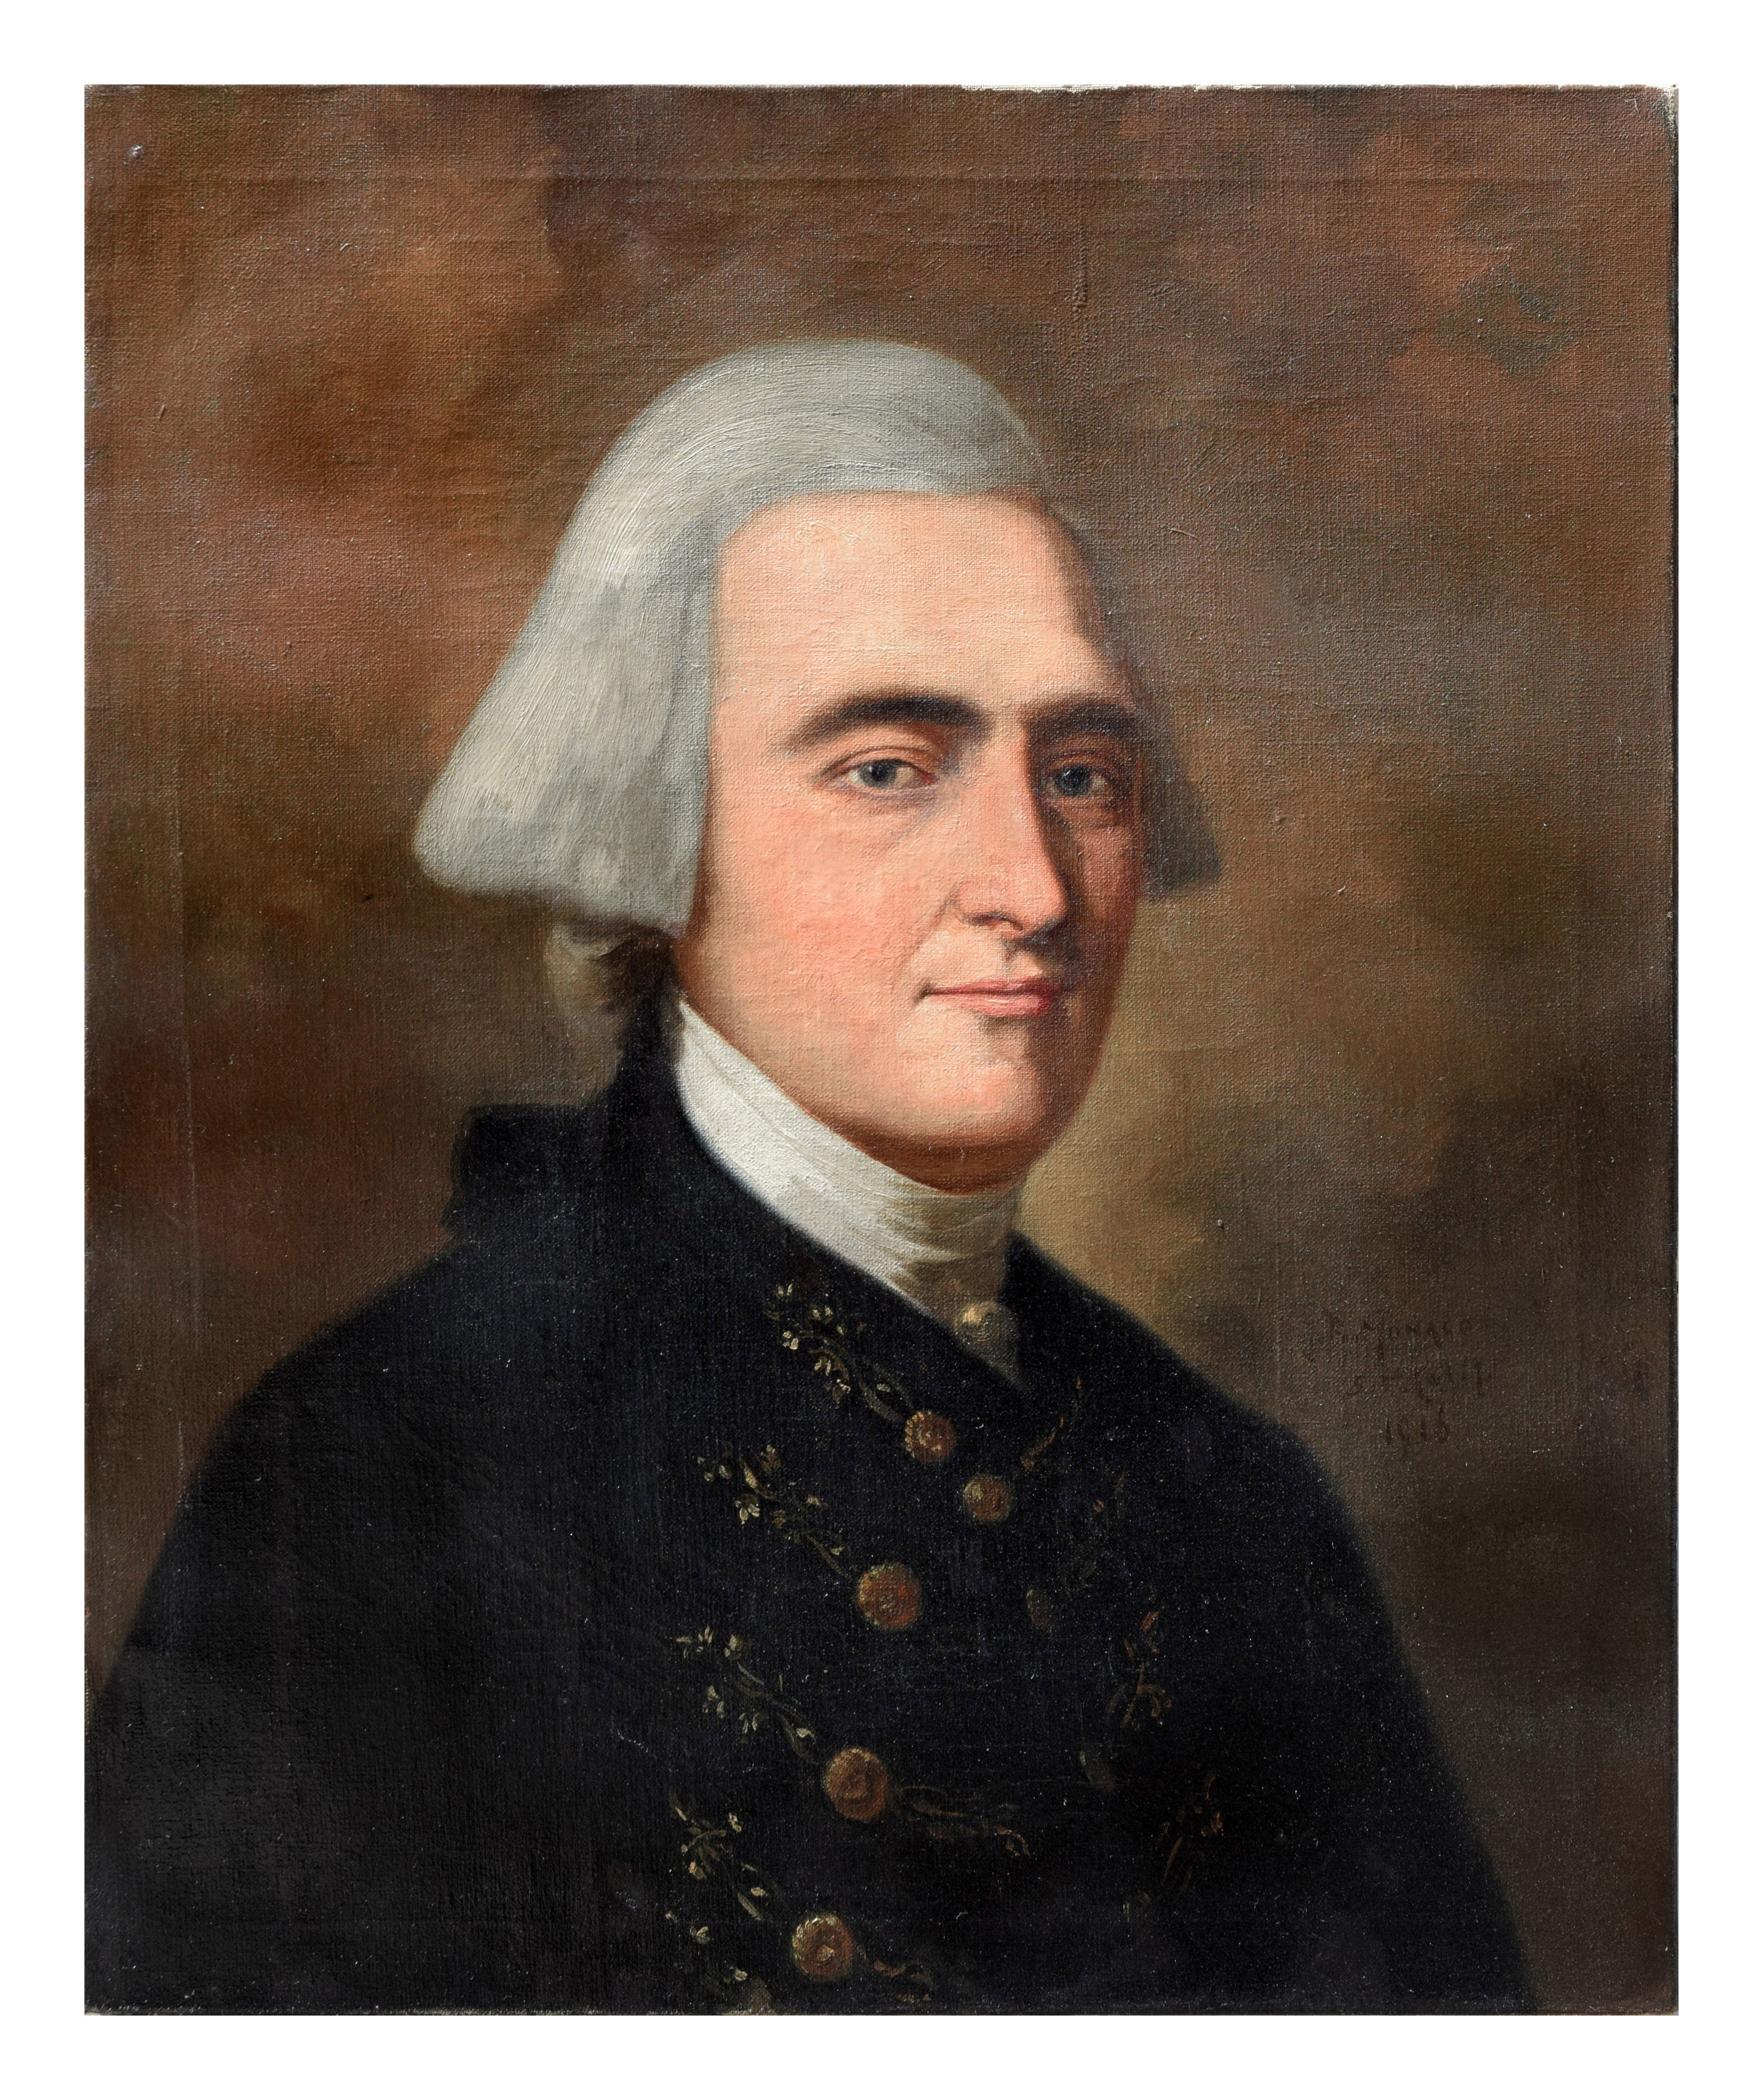 Study of John Singleton Copley's painting of John Hancock